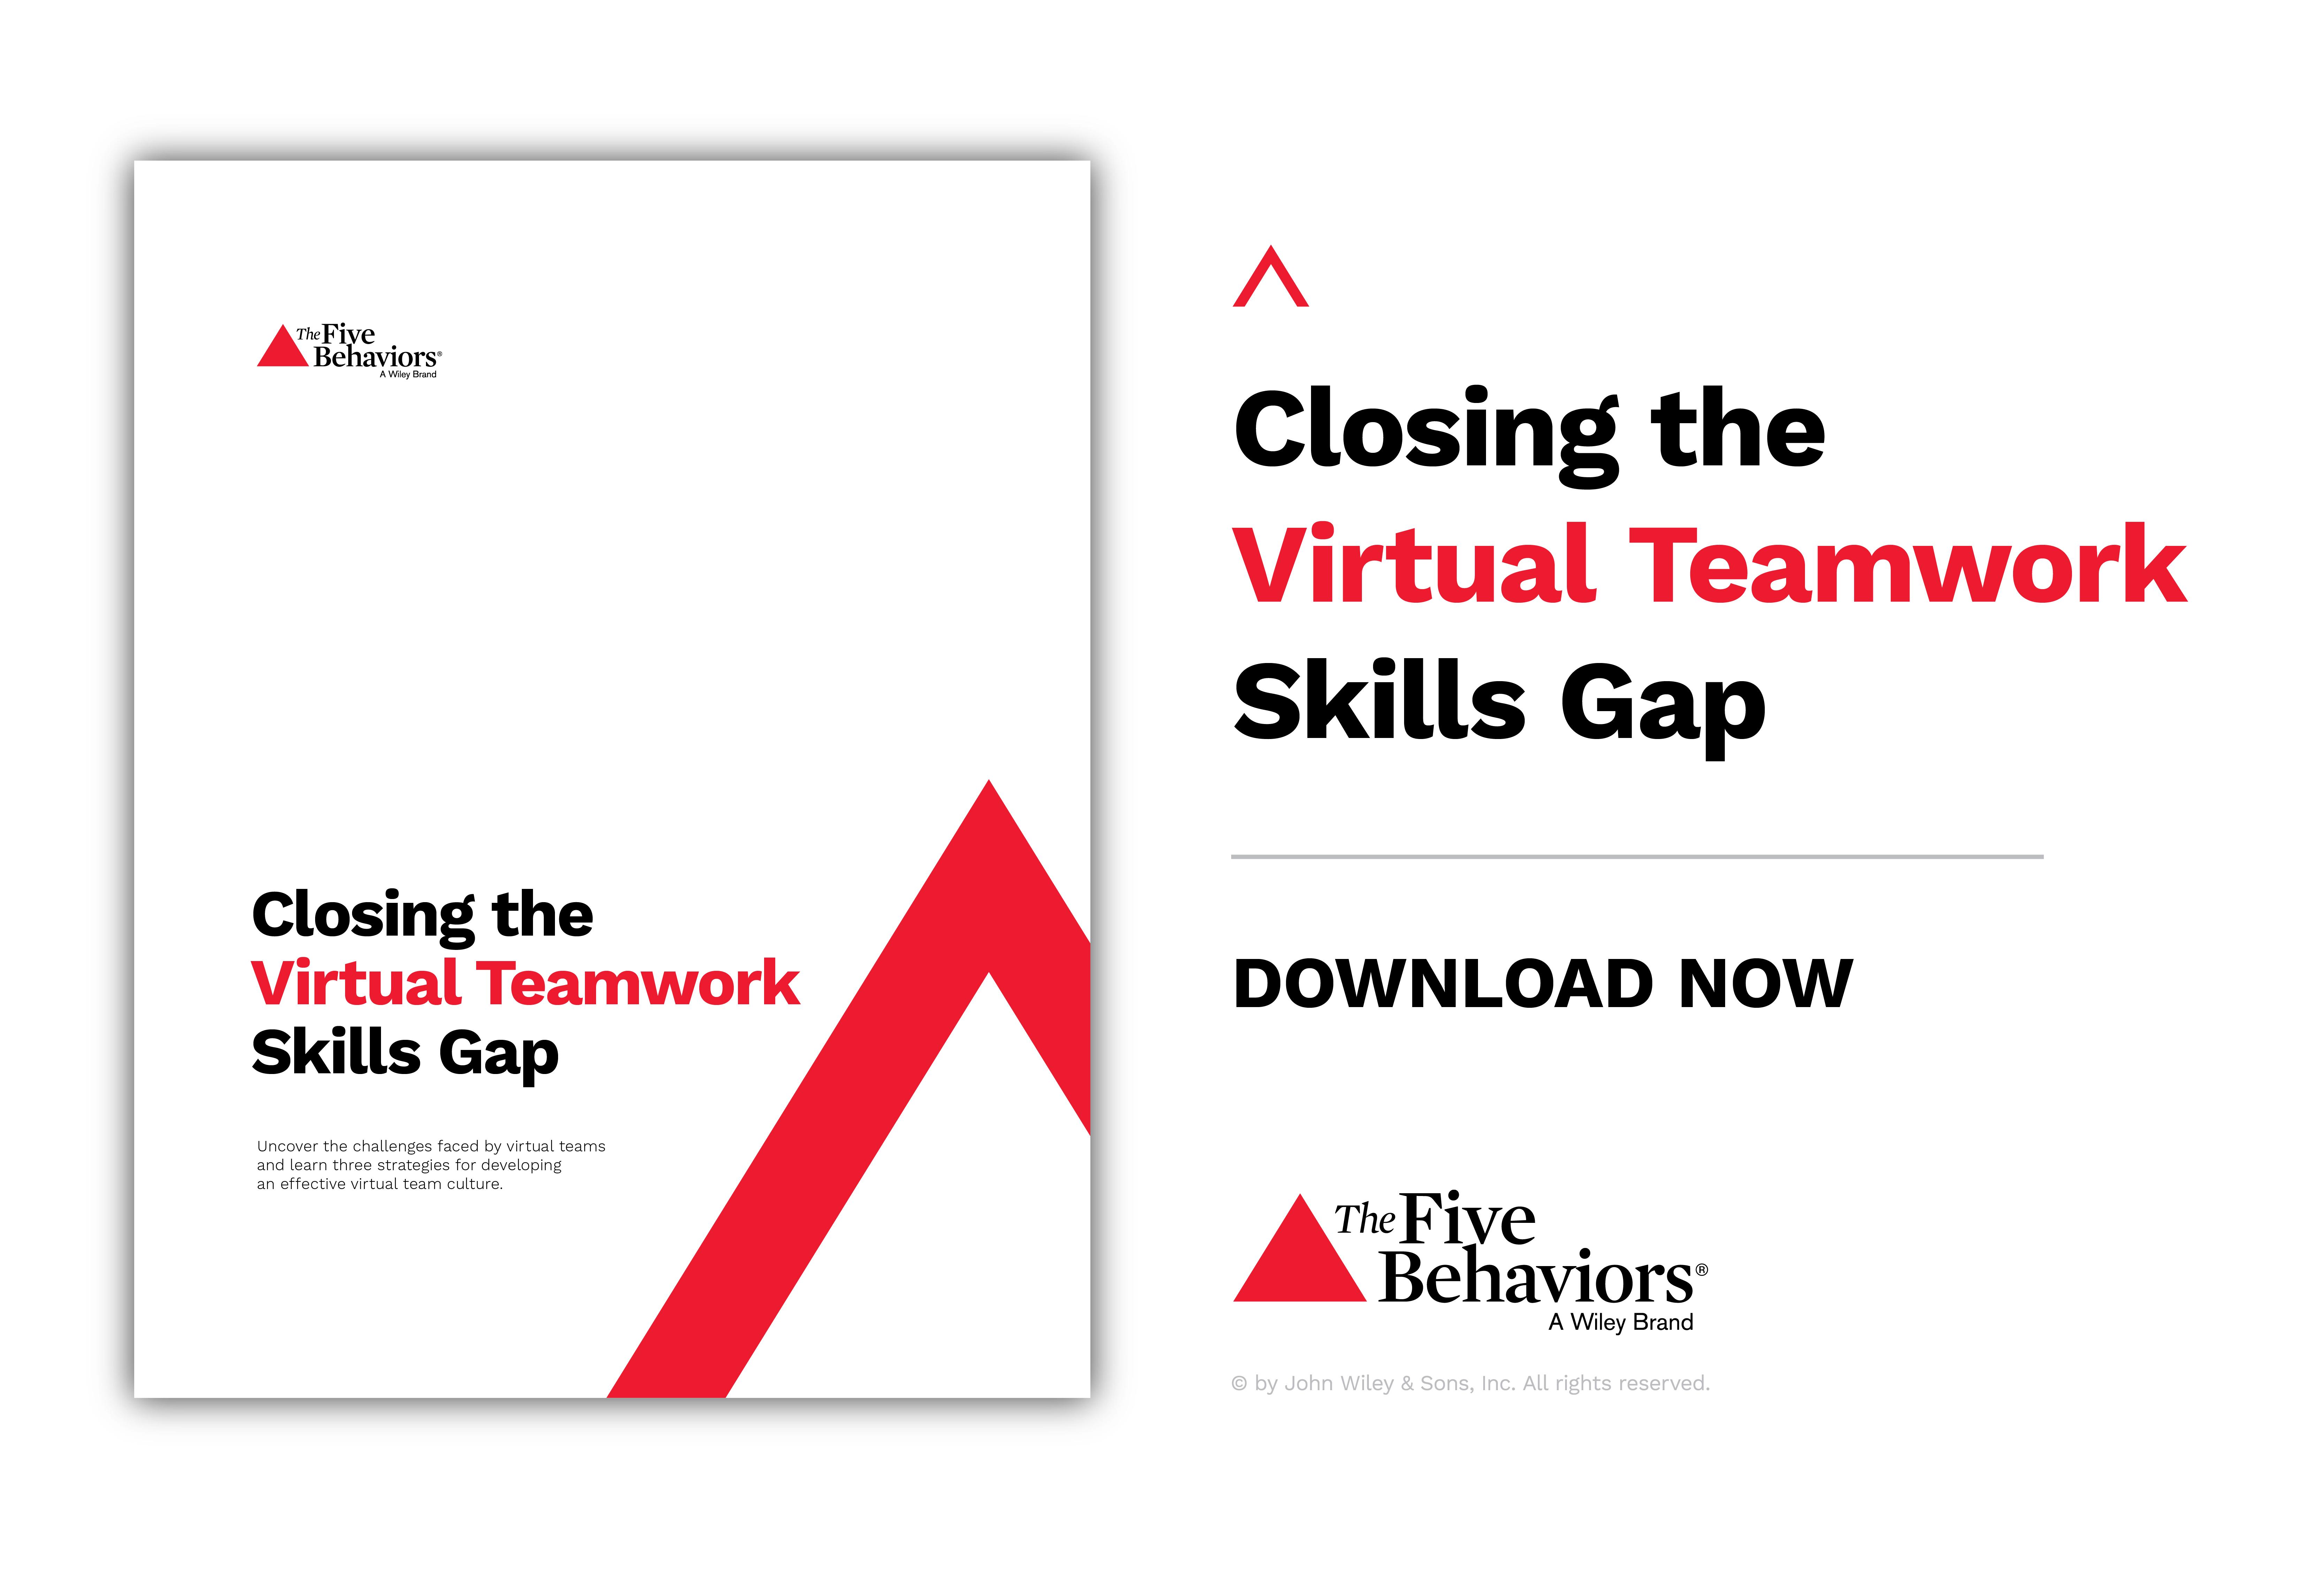 Closing the Virtual Teamwork Skills Gap White Paper